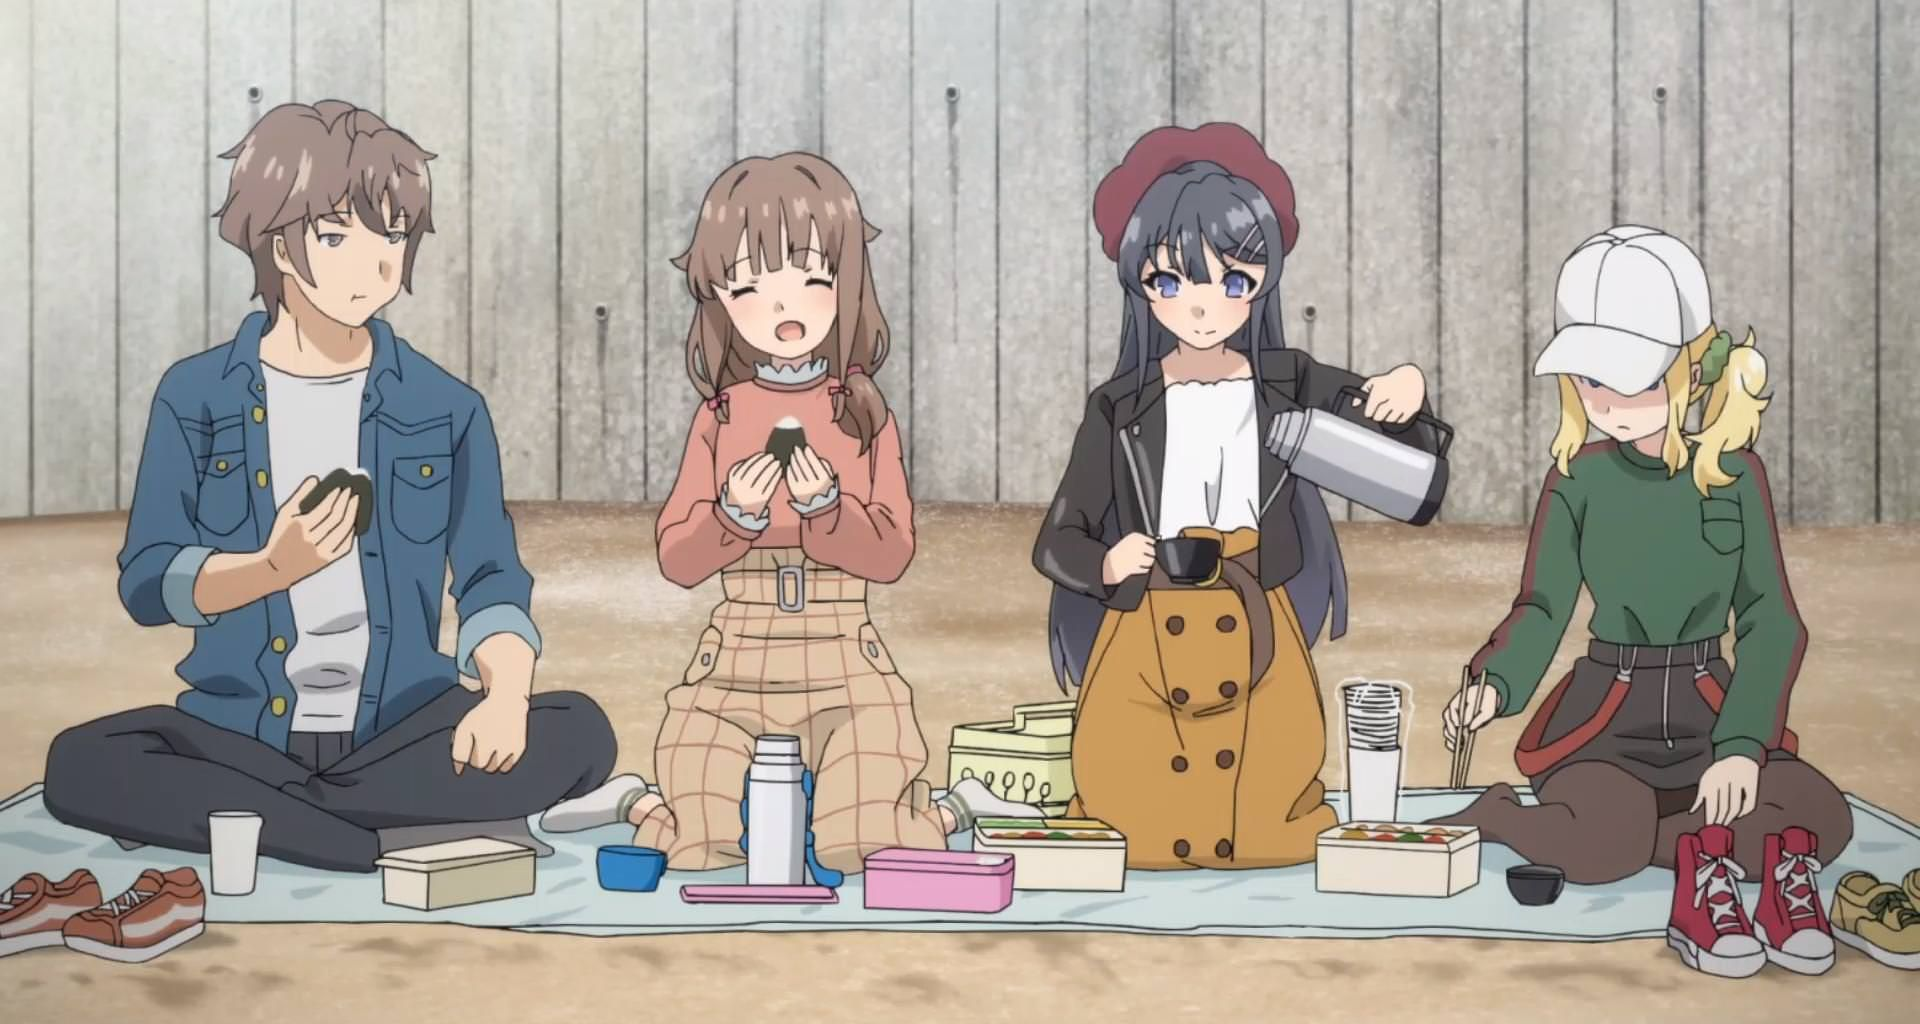 Seishun Buta Yarou Wa Bunny Girl Senpai No Yume Wo Minai Episode 11 Discussion 50 Forums Myanimelist Net Bunny Girl Anime Senpai